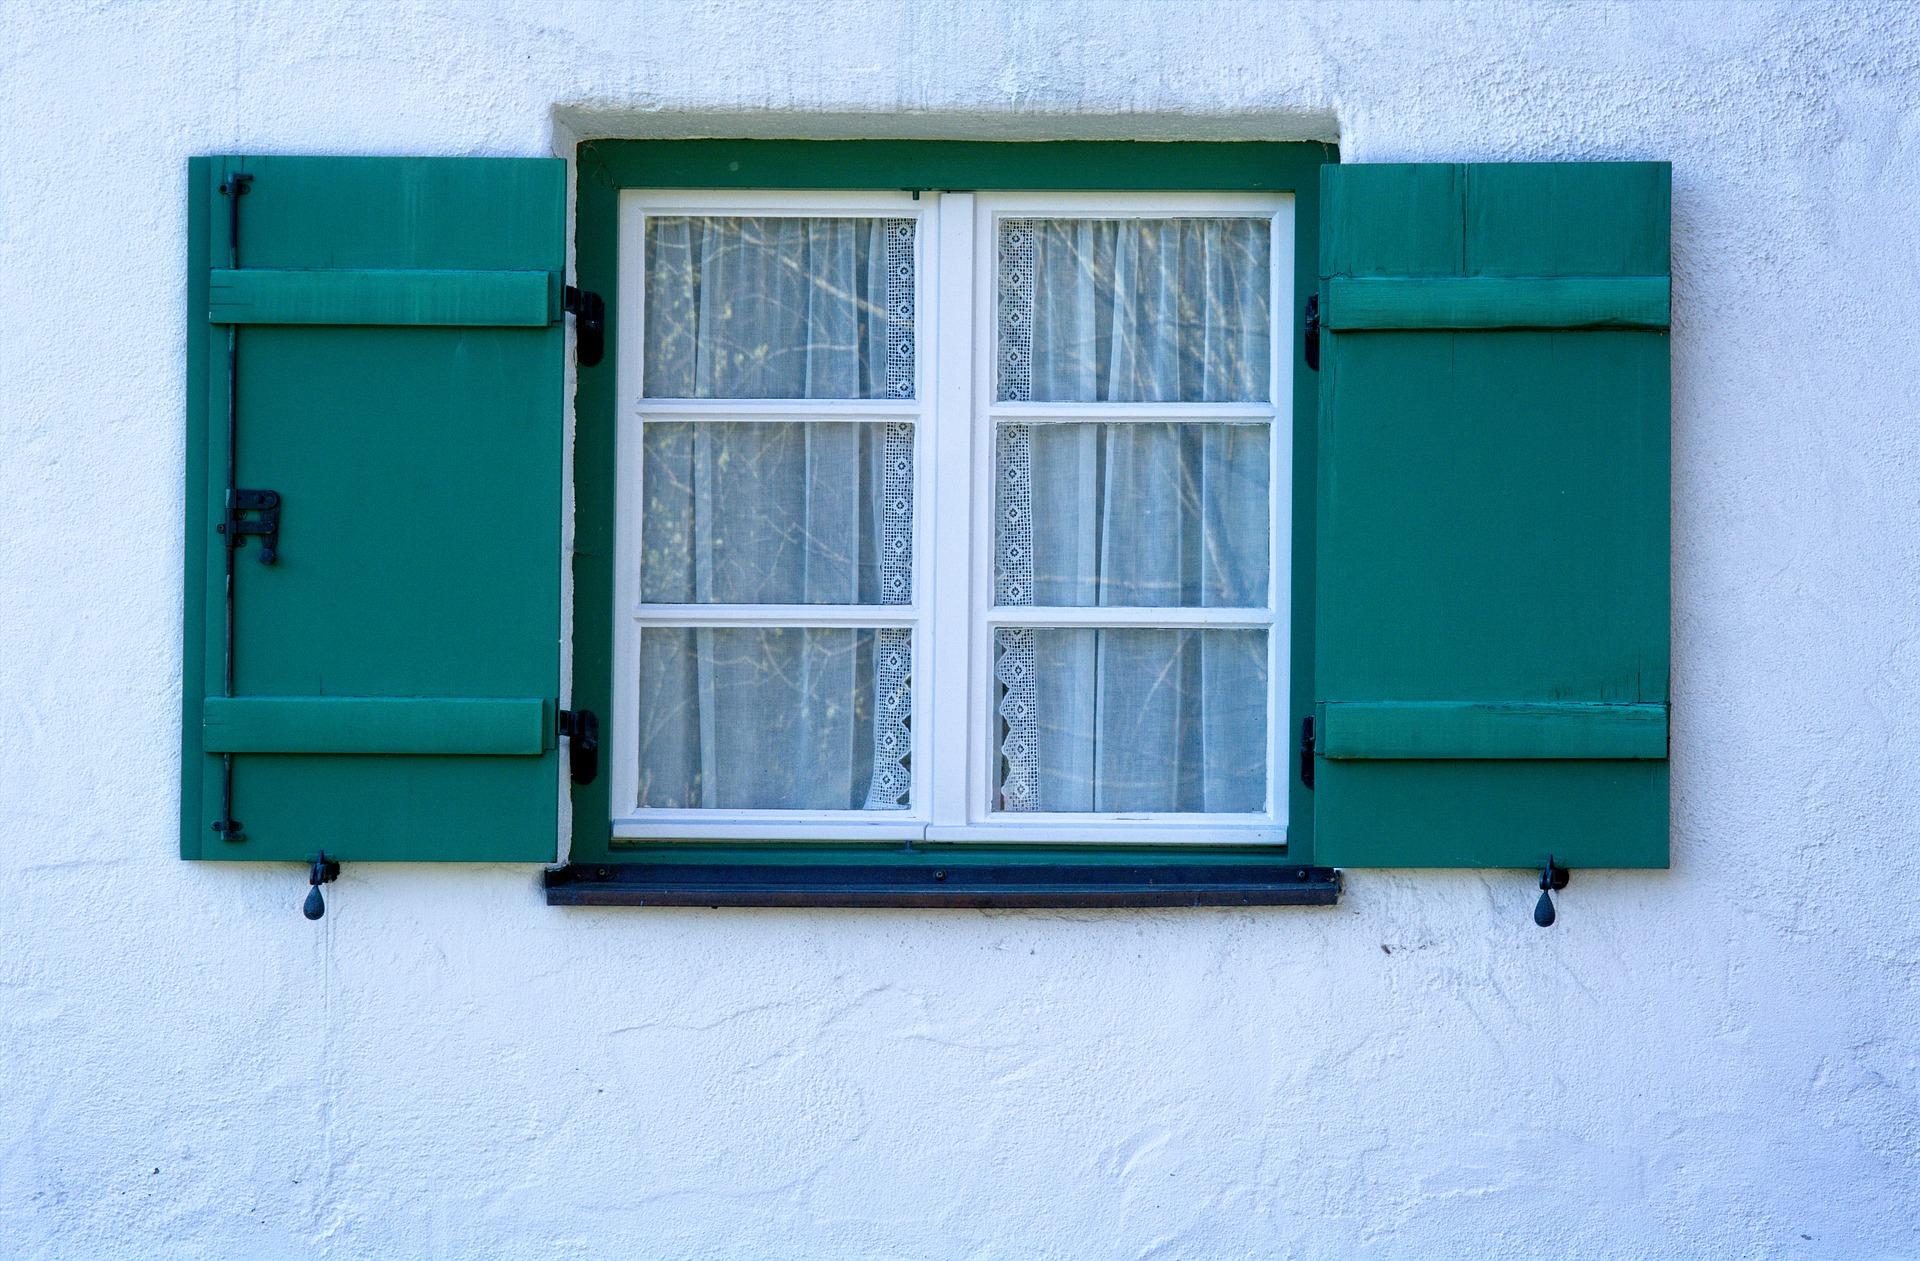 kastenfenster isolieren dank guter d mmung geld sparen. Black Bedroom Furniture Sets. Home Design Ideas